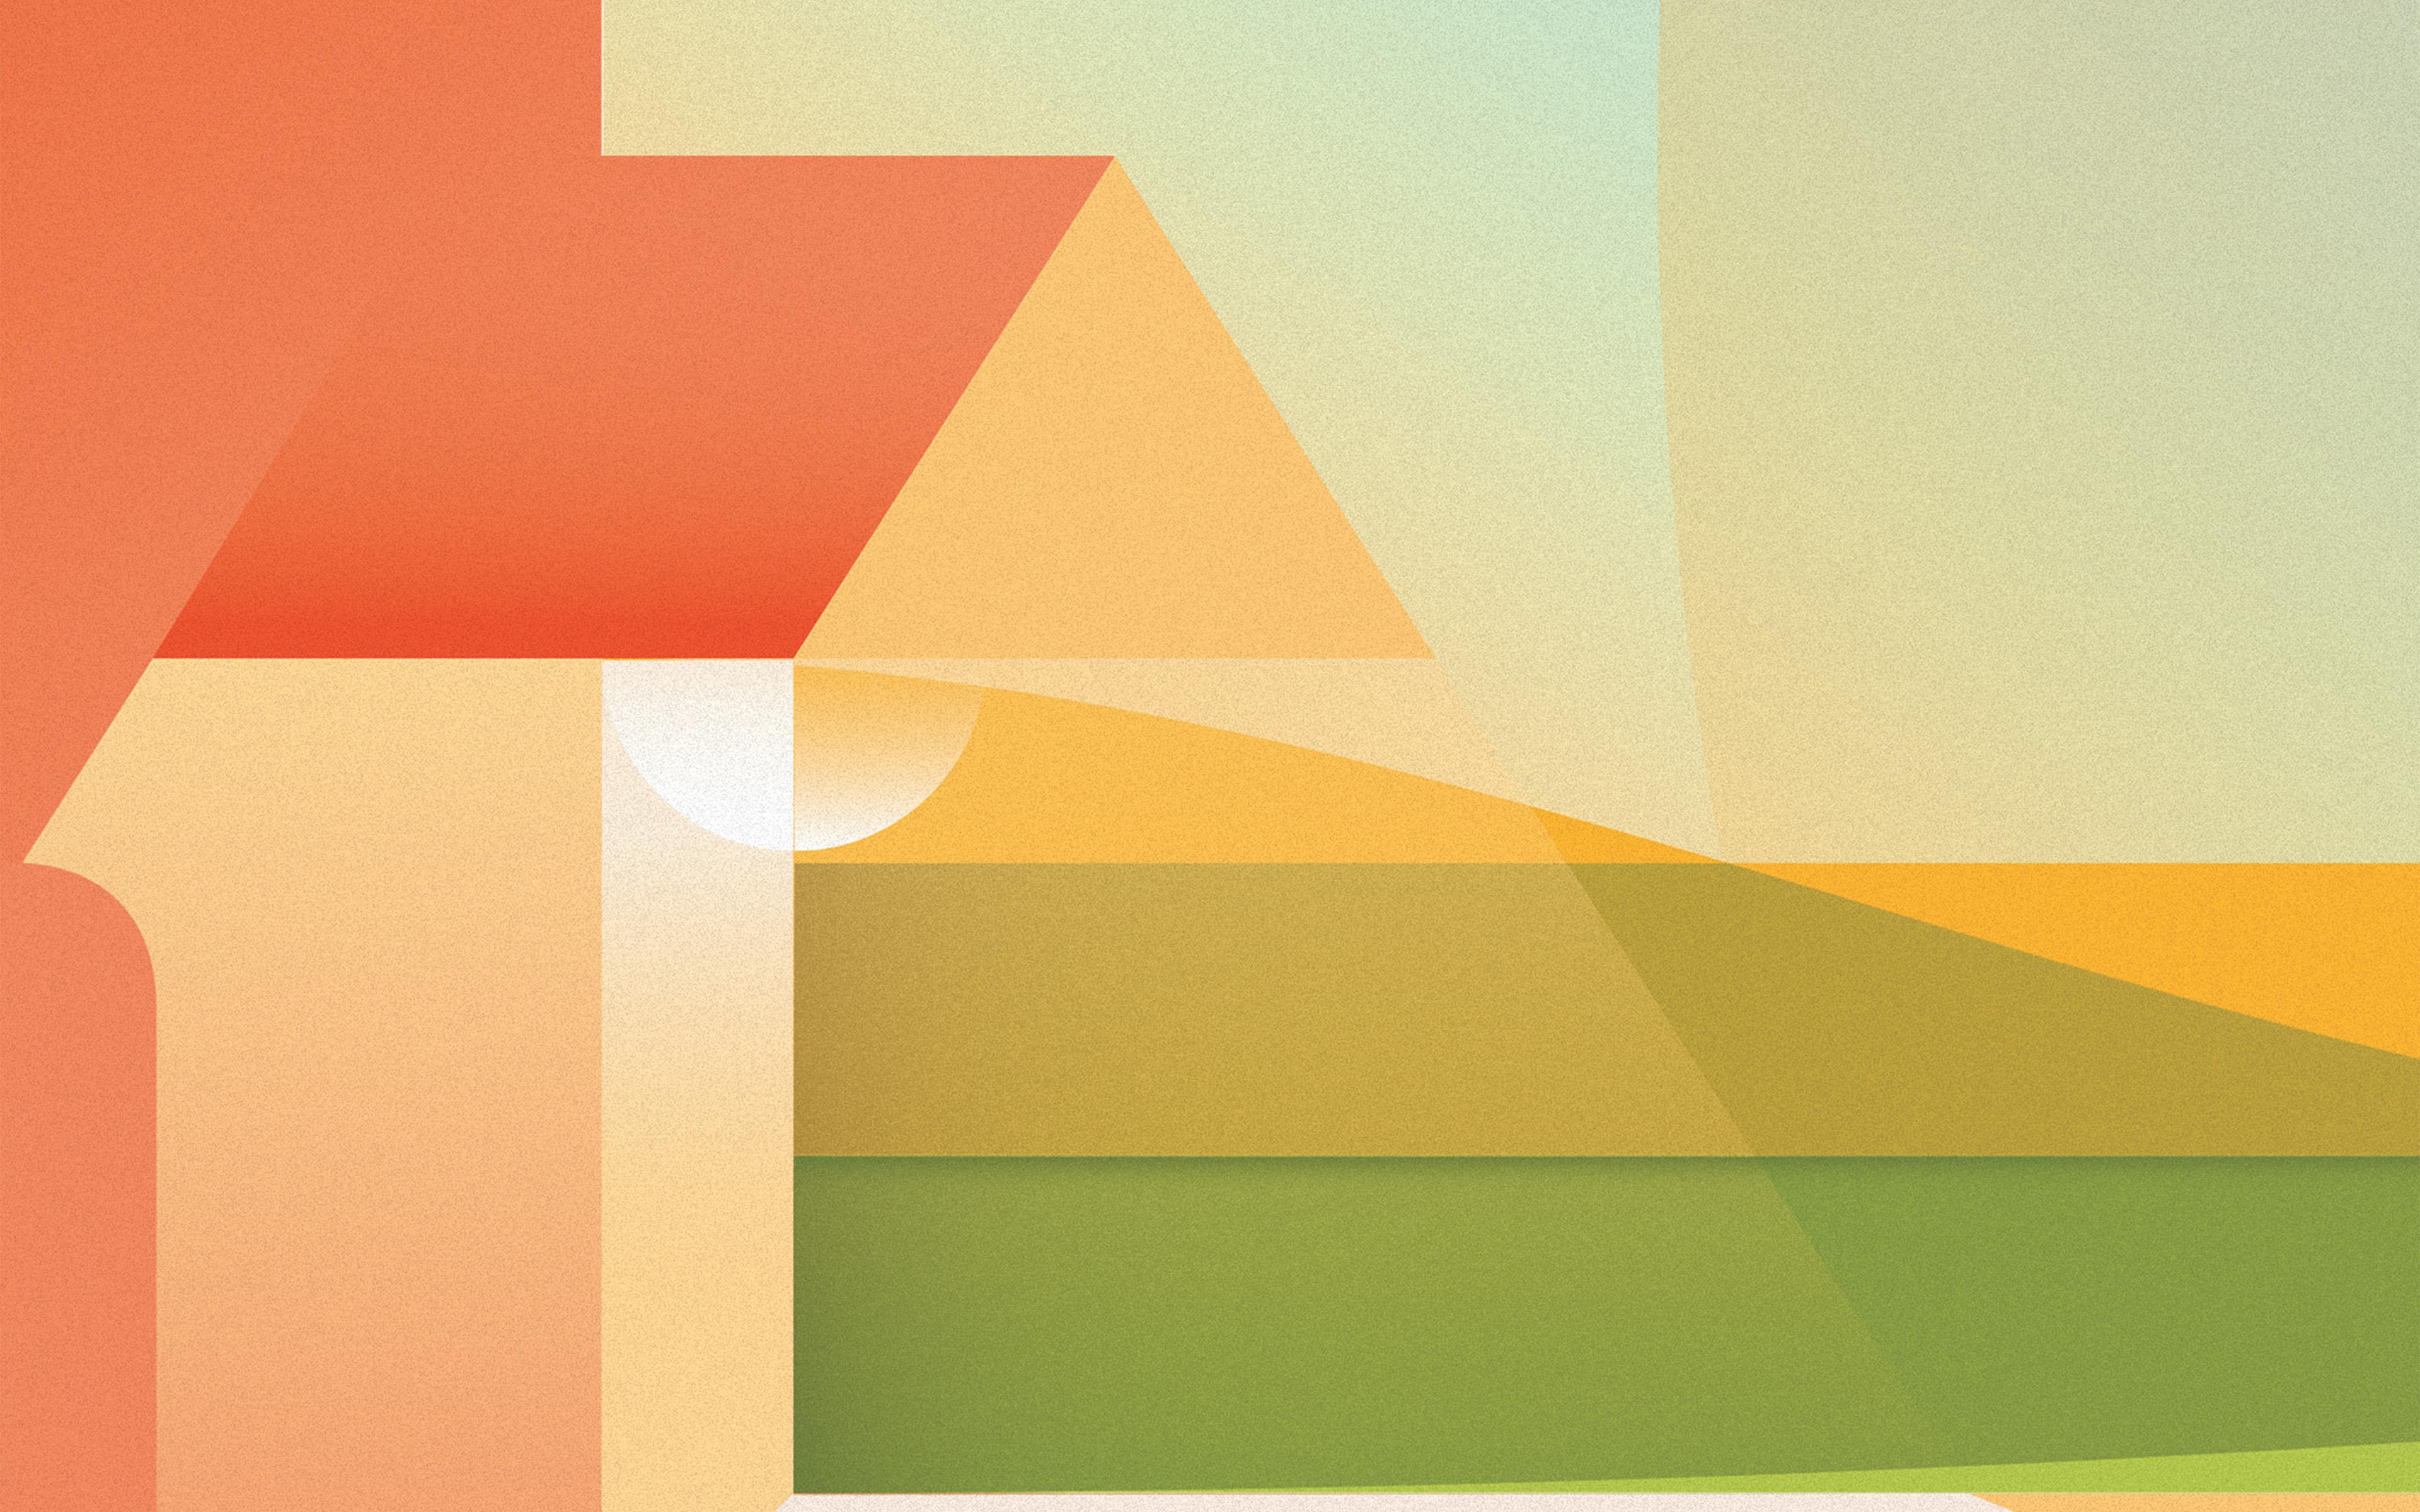 Wallpaper For Desktop Laptop Vx46 Noise Simple Minimal Color Soft Pastel Pattern Background